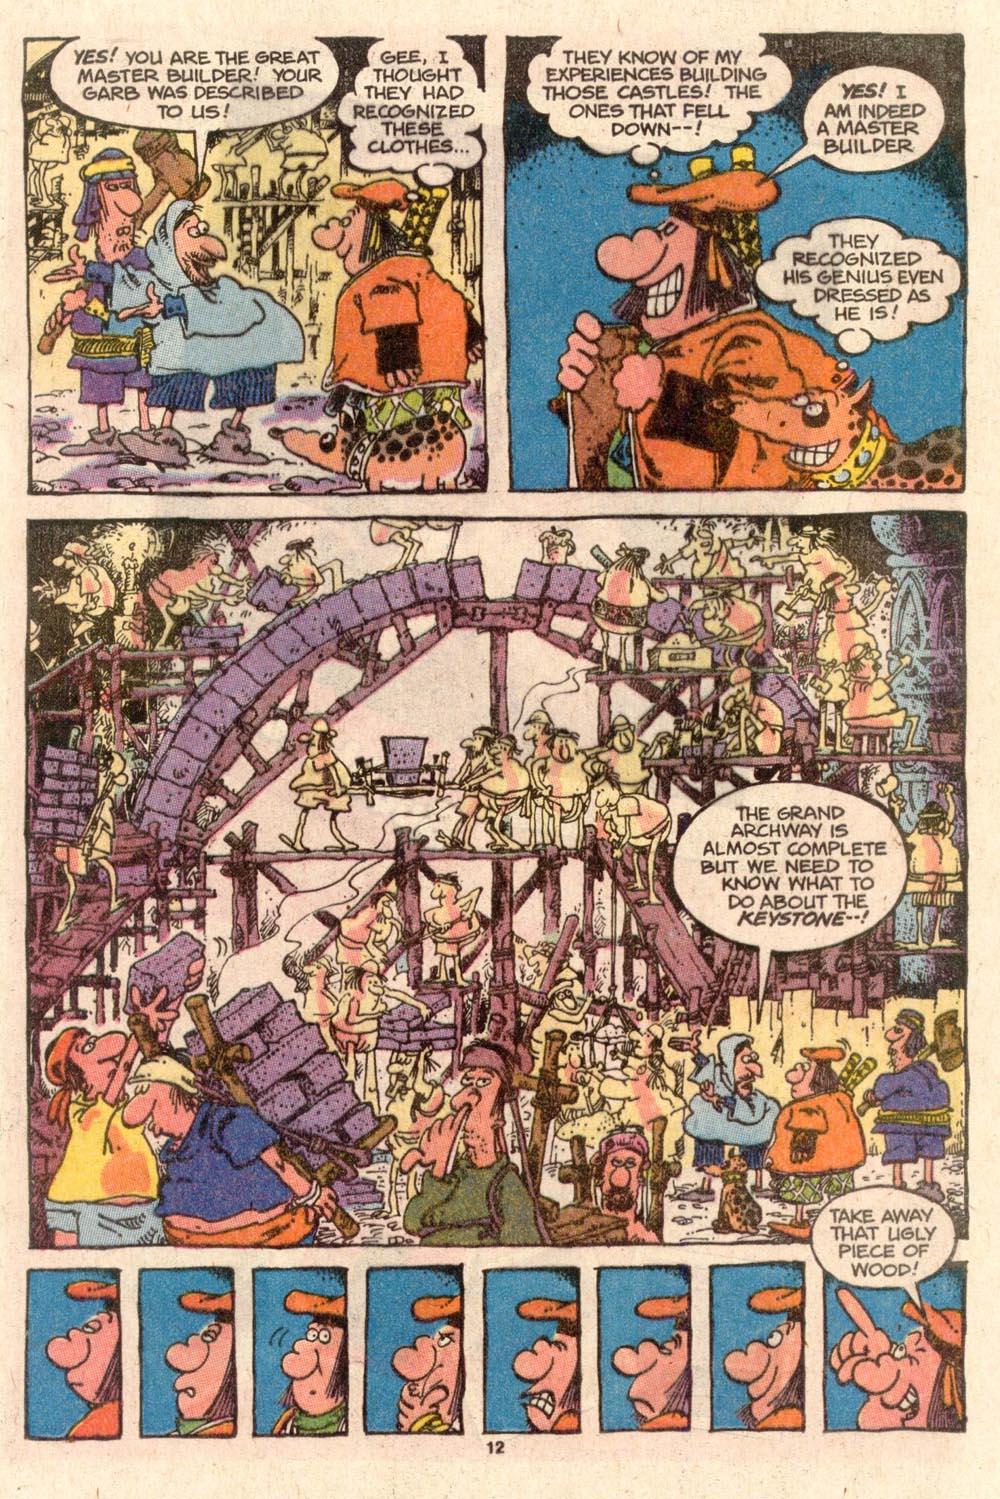 Read online Sergio Aragonés Groo the Wanderer comic -  Issue #46 - 12